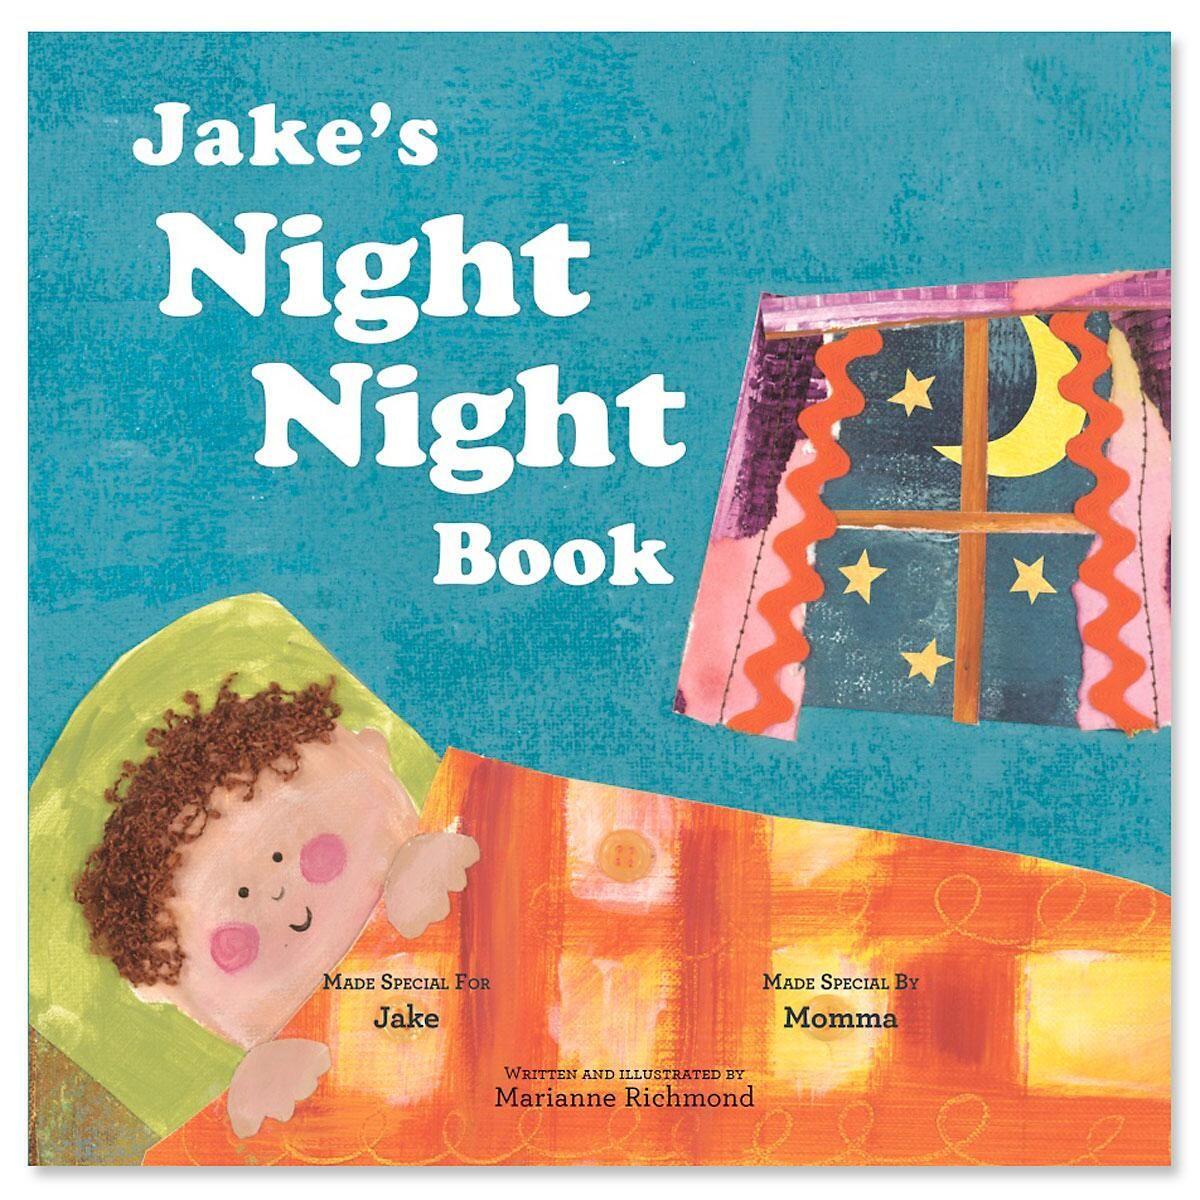 My Night Night Personalized Story Book